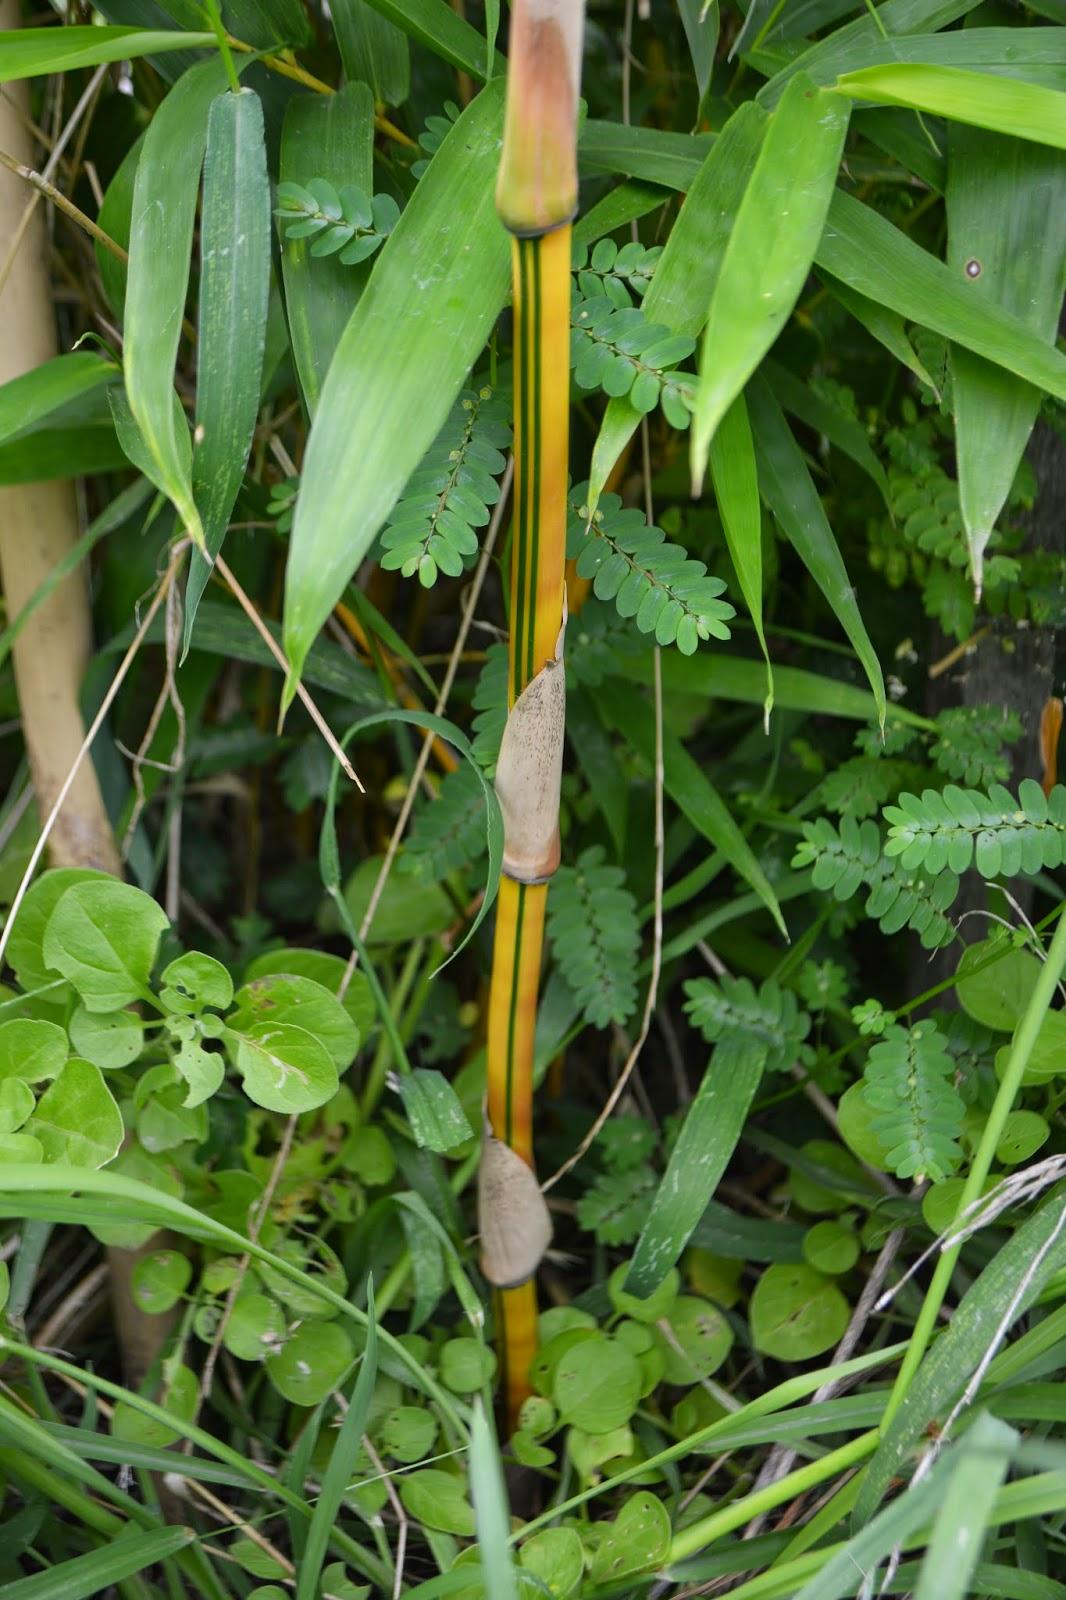 Bambusa Vulgaris Vittata- nace amarilla y con franjas verdes